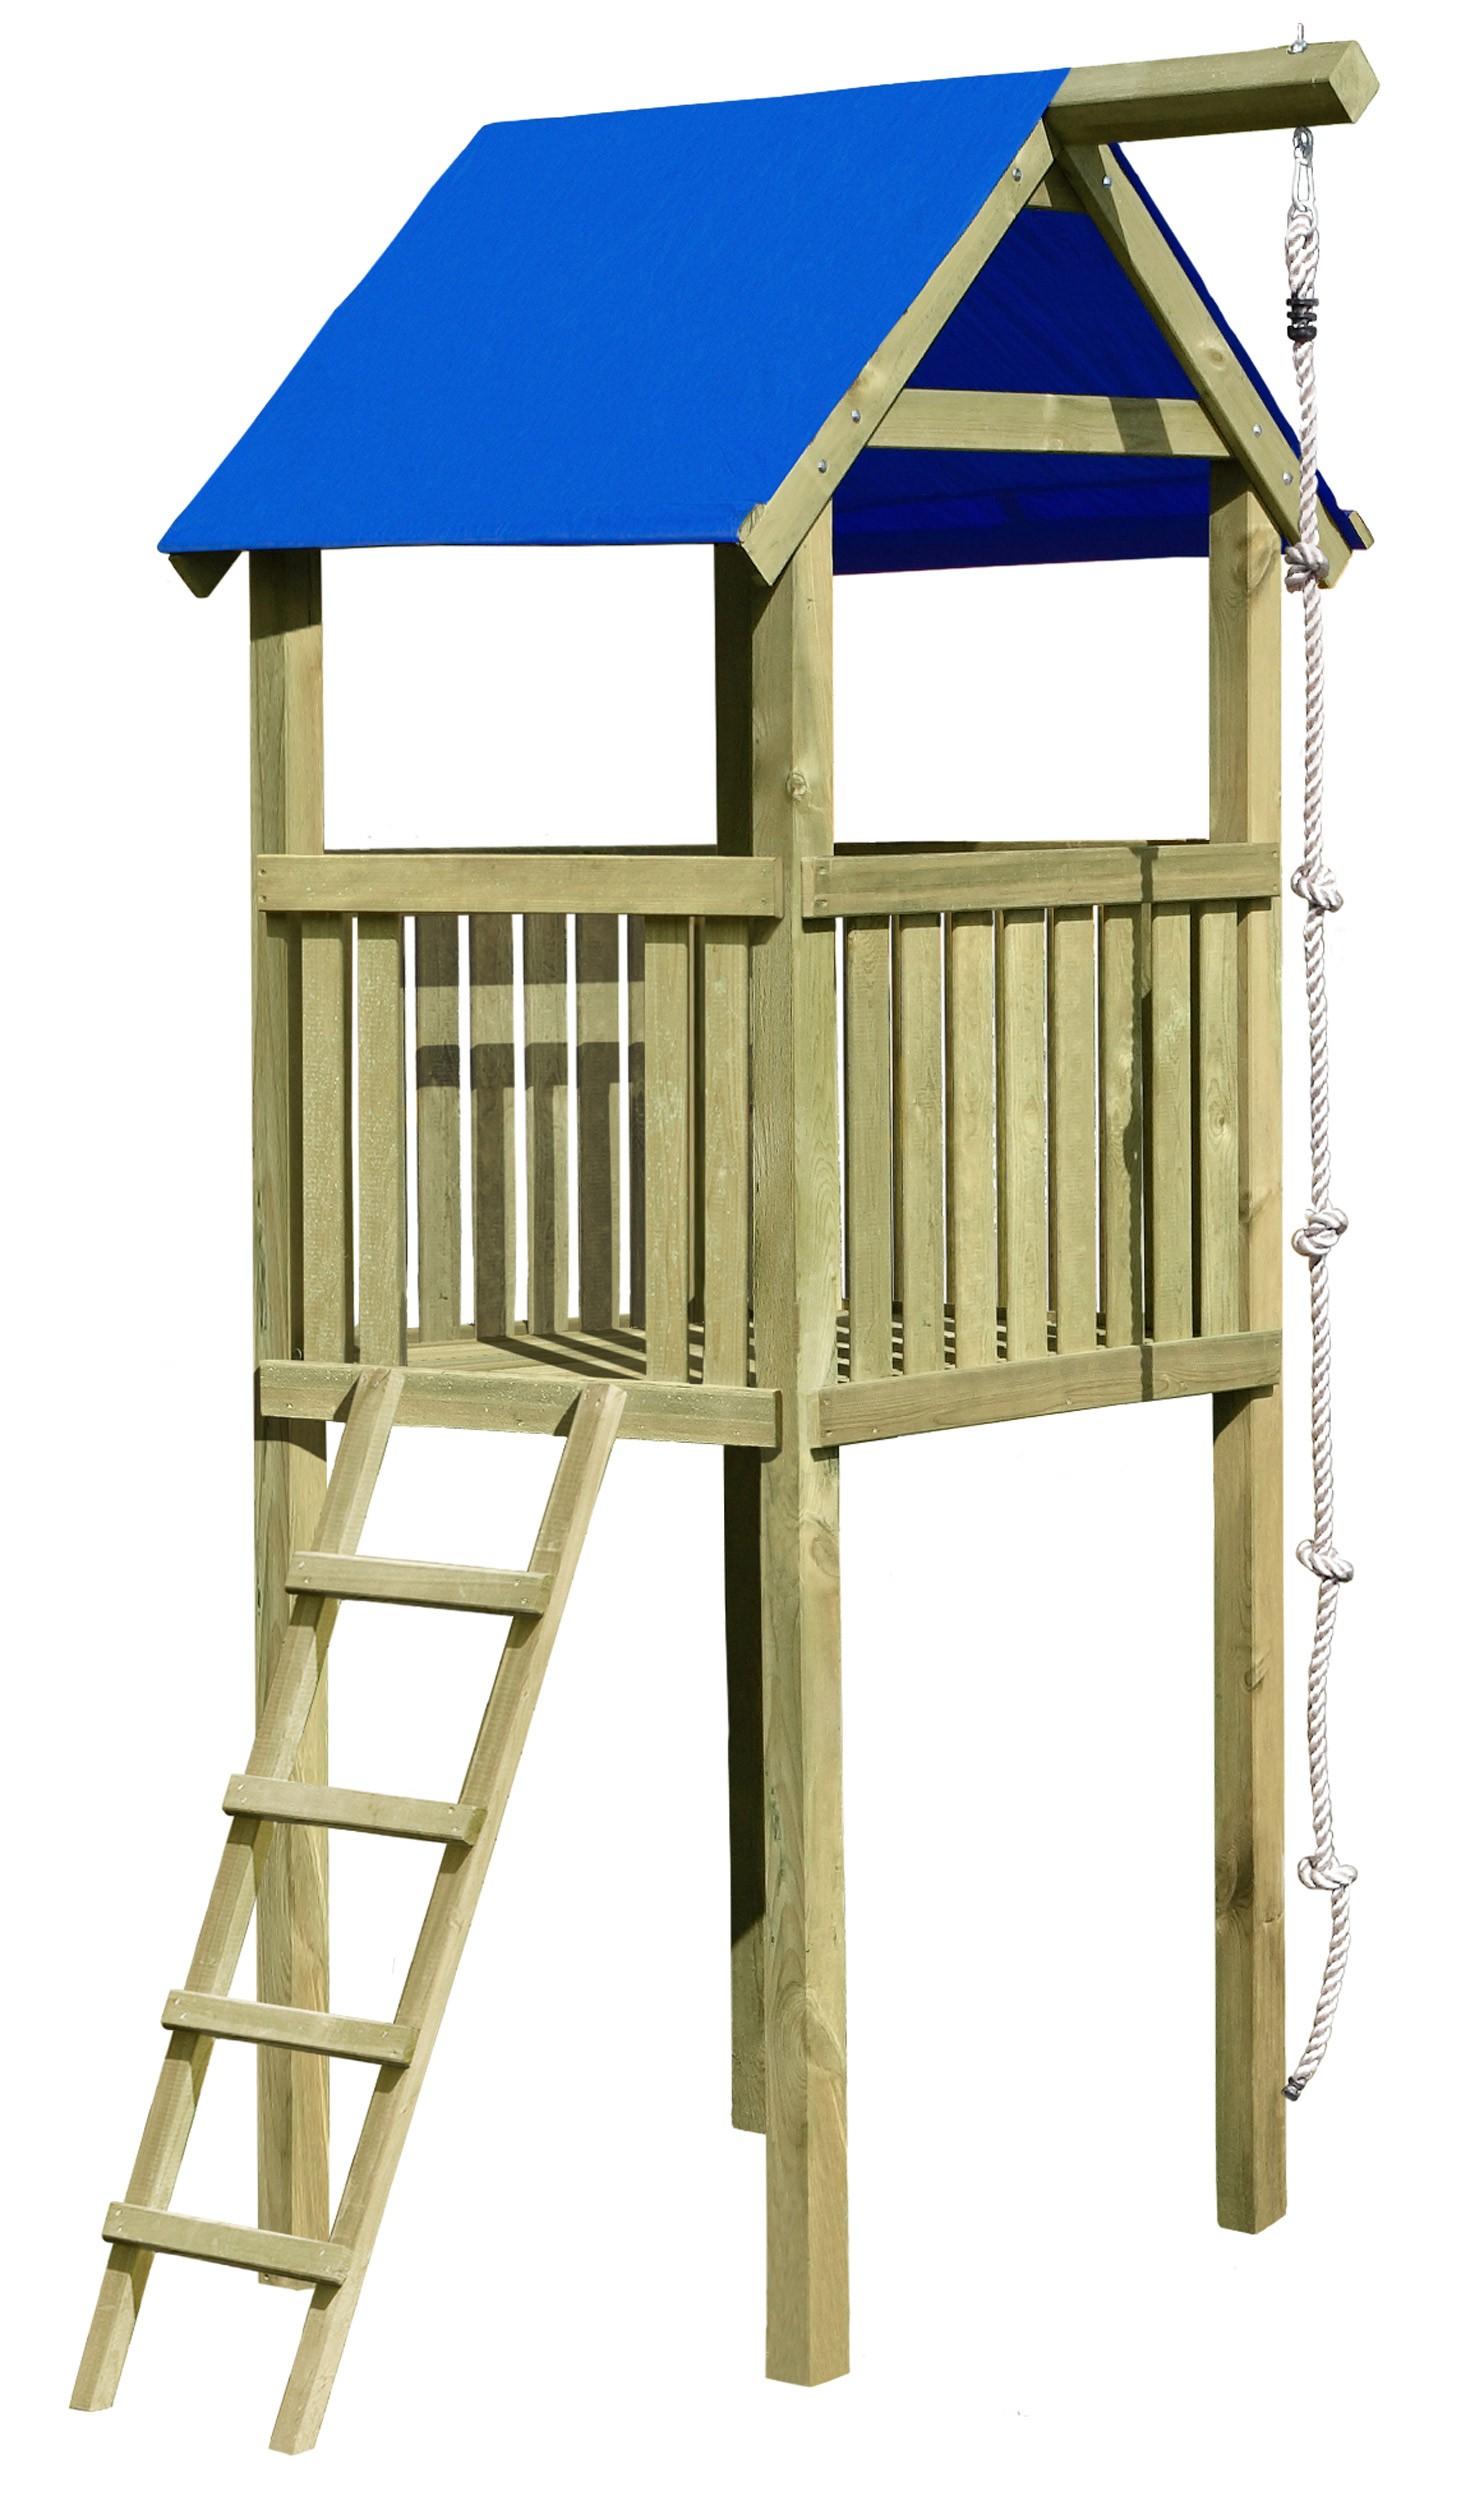 Spielturm / Grundturm Multi-Play 118 x 118 x 350 cm - bei ...